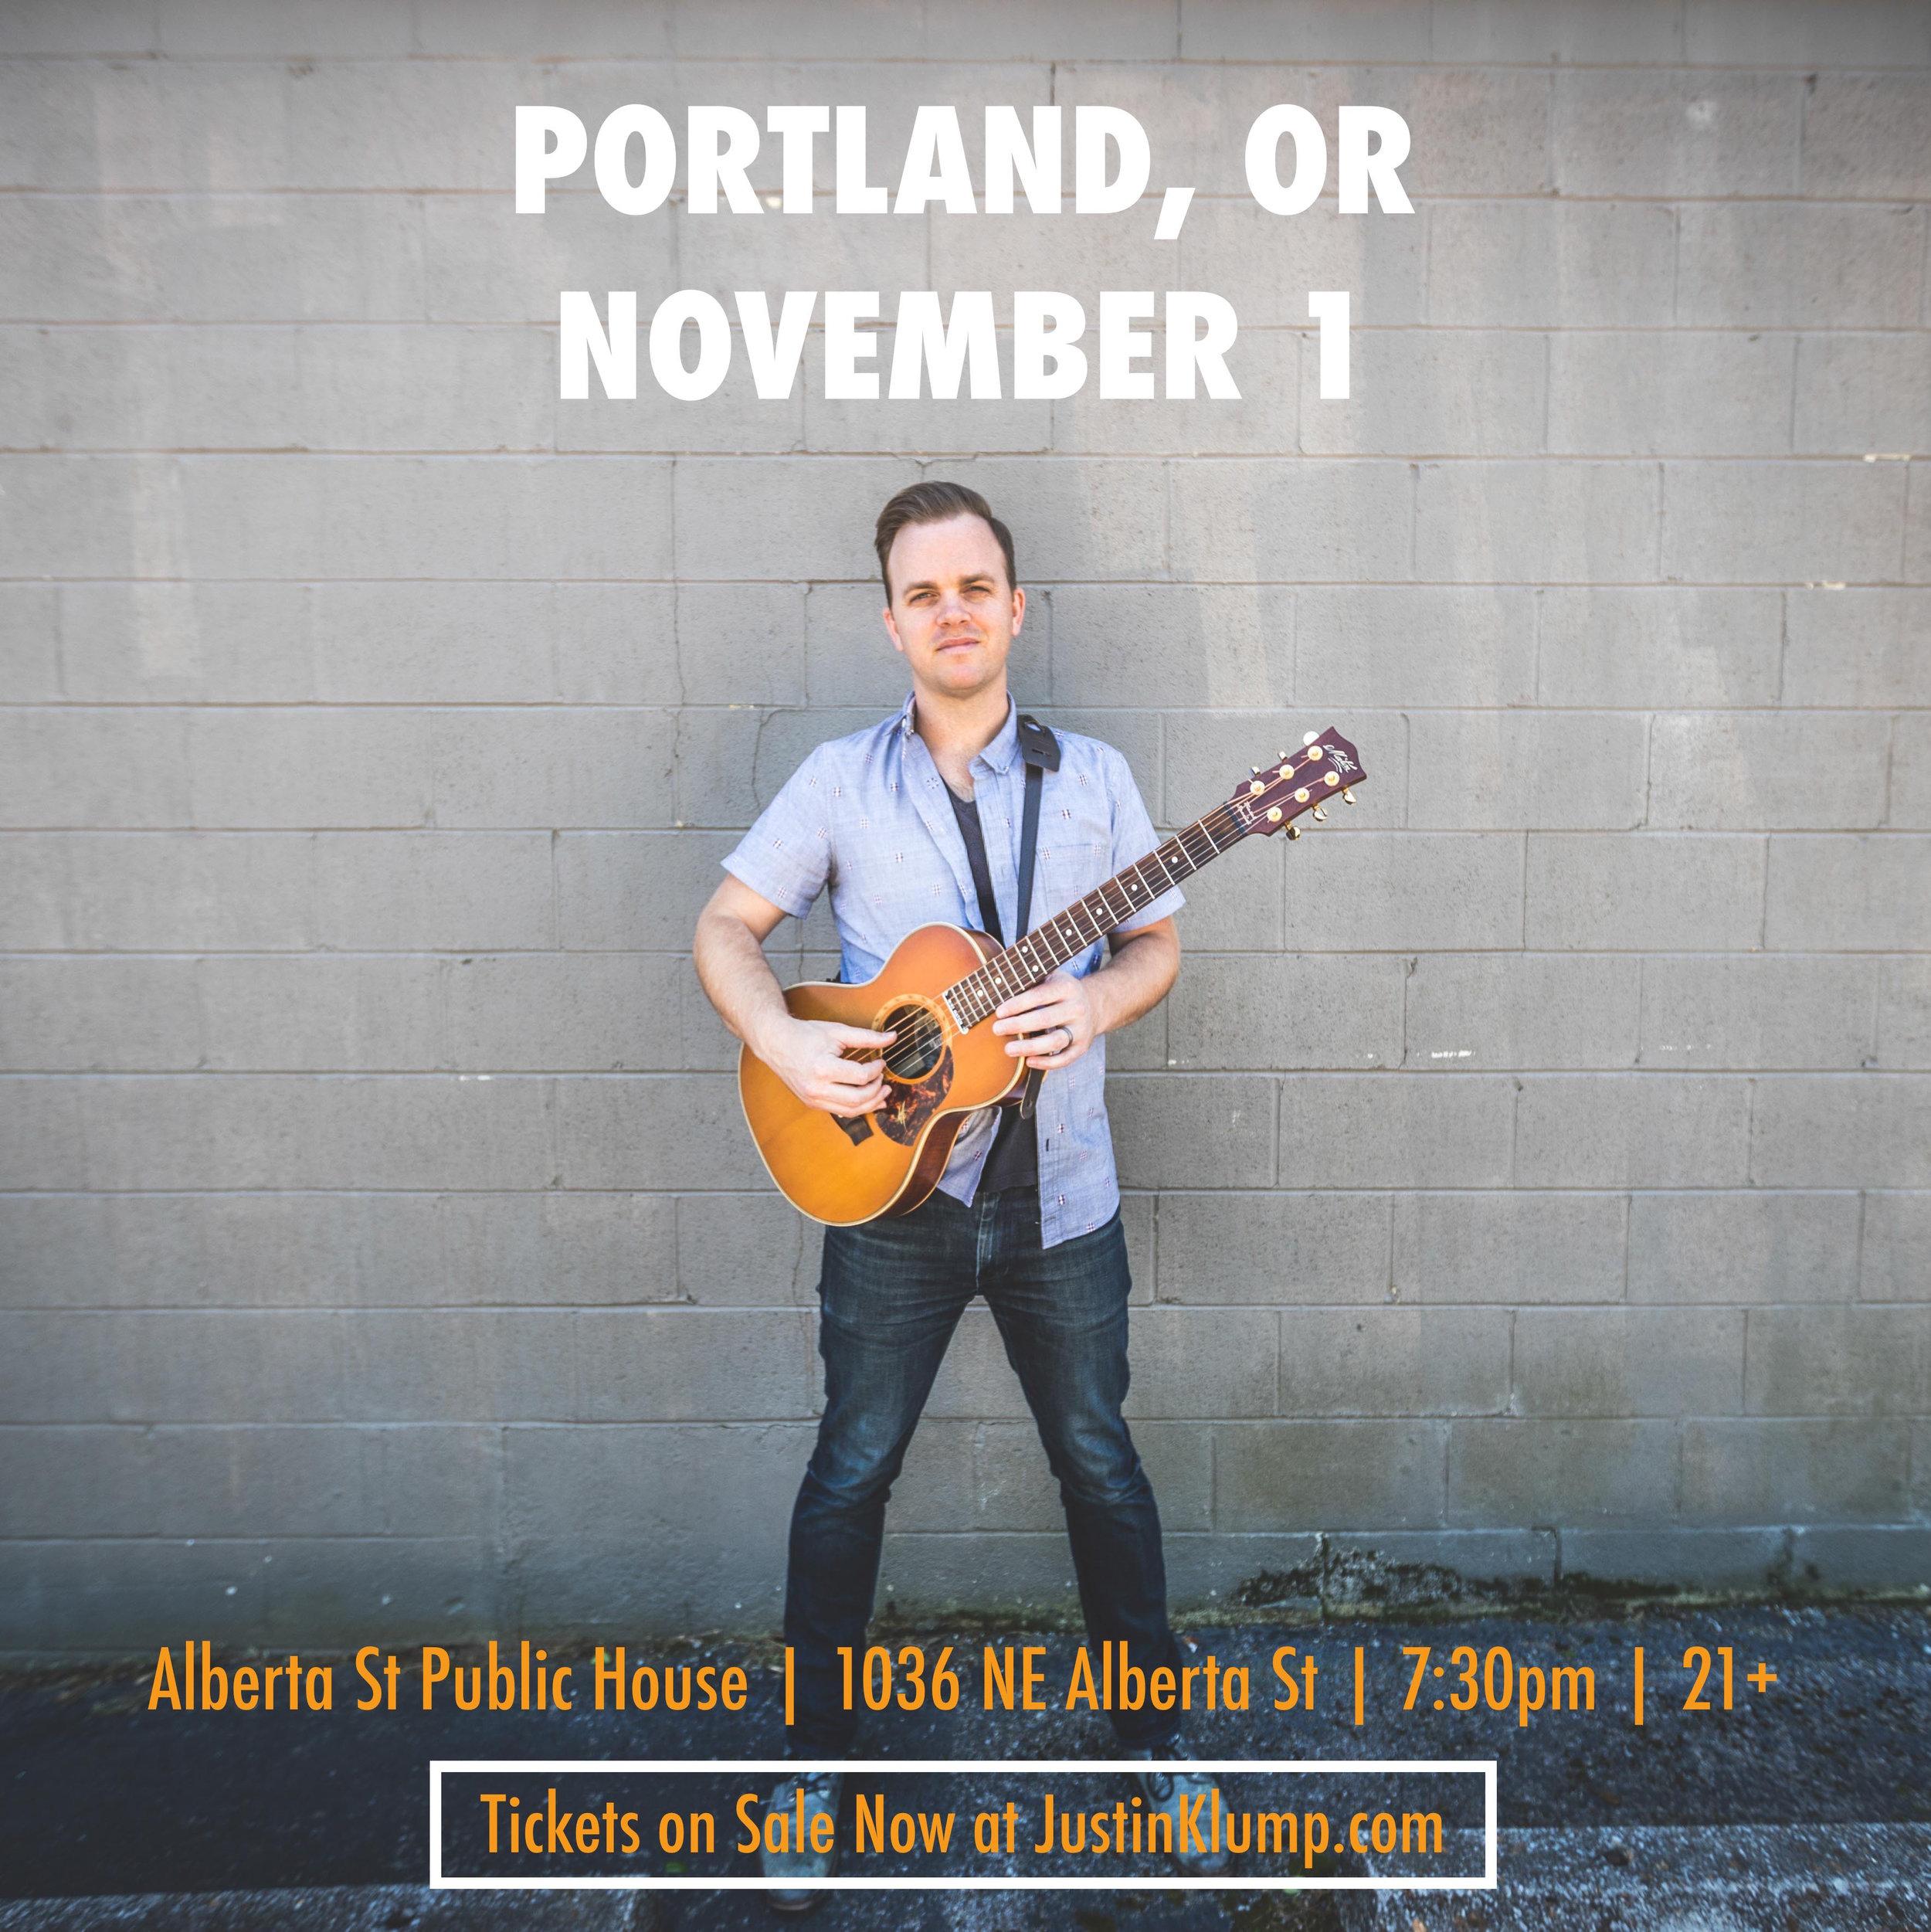 Portland Nov 1 Square copy.jpg